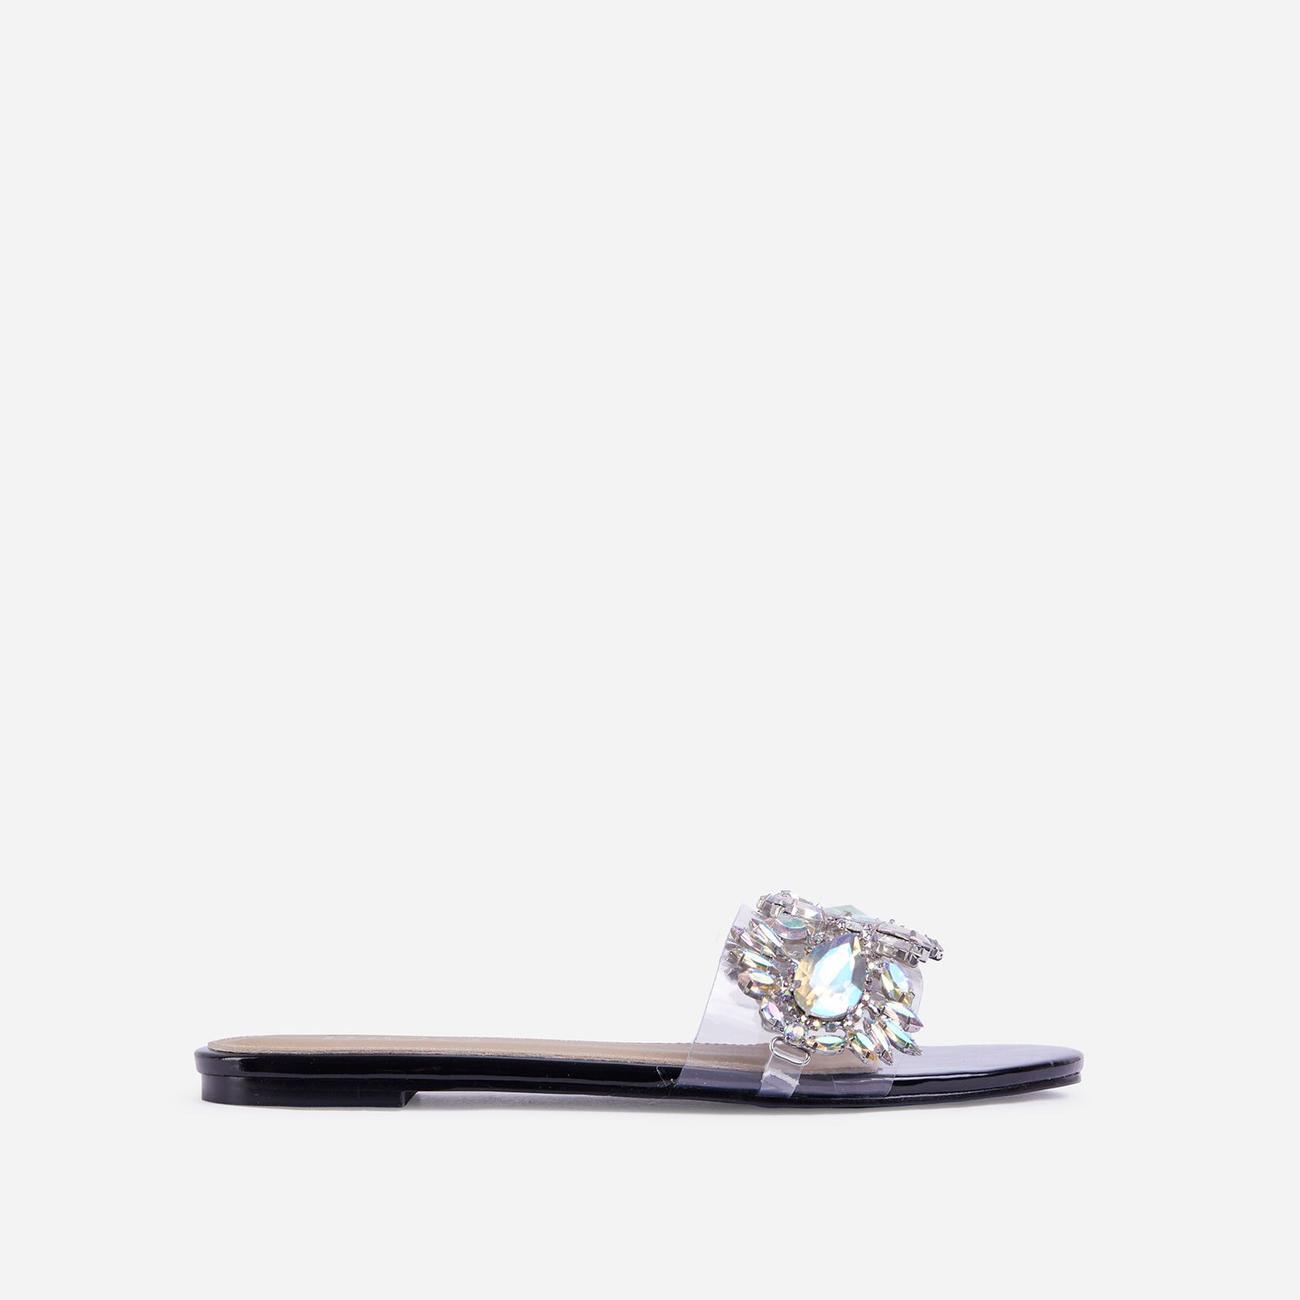 Duchess Diamante Gem Detail Perspex Flat Slider Sandal In Black Patent Image 1